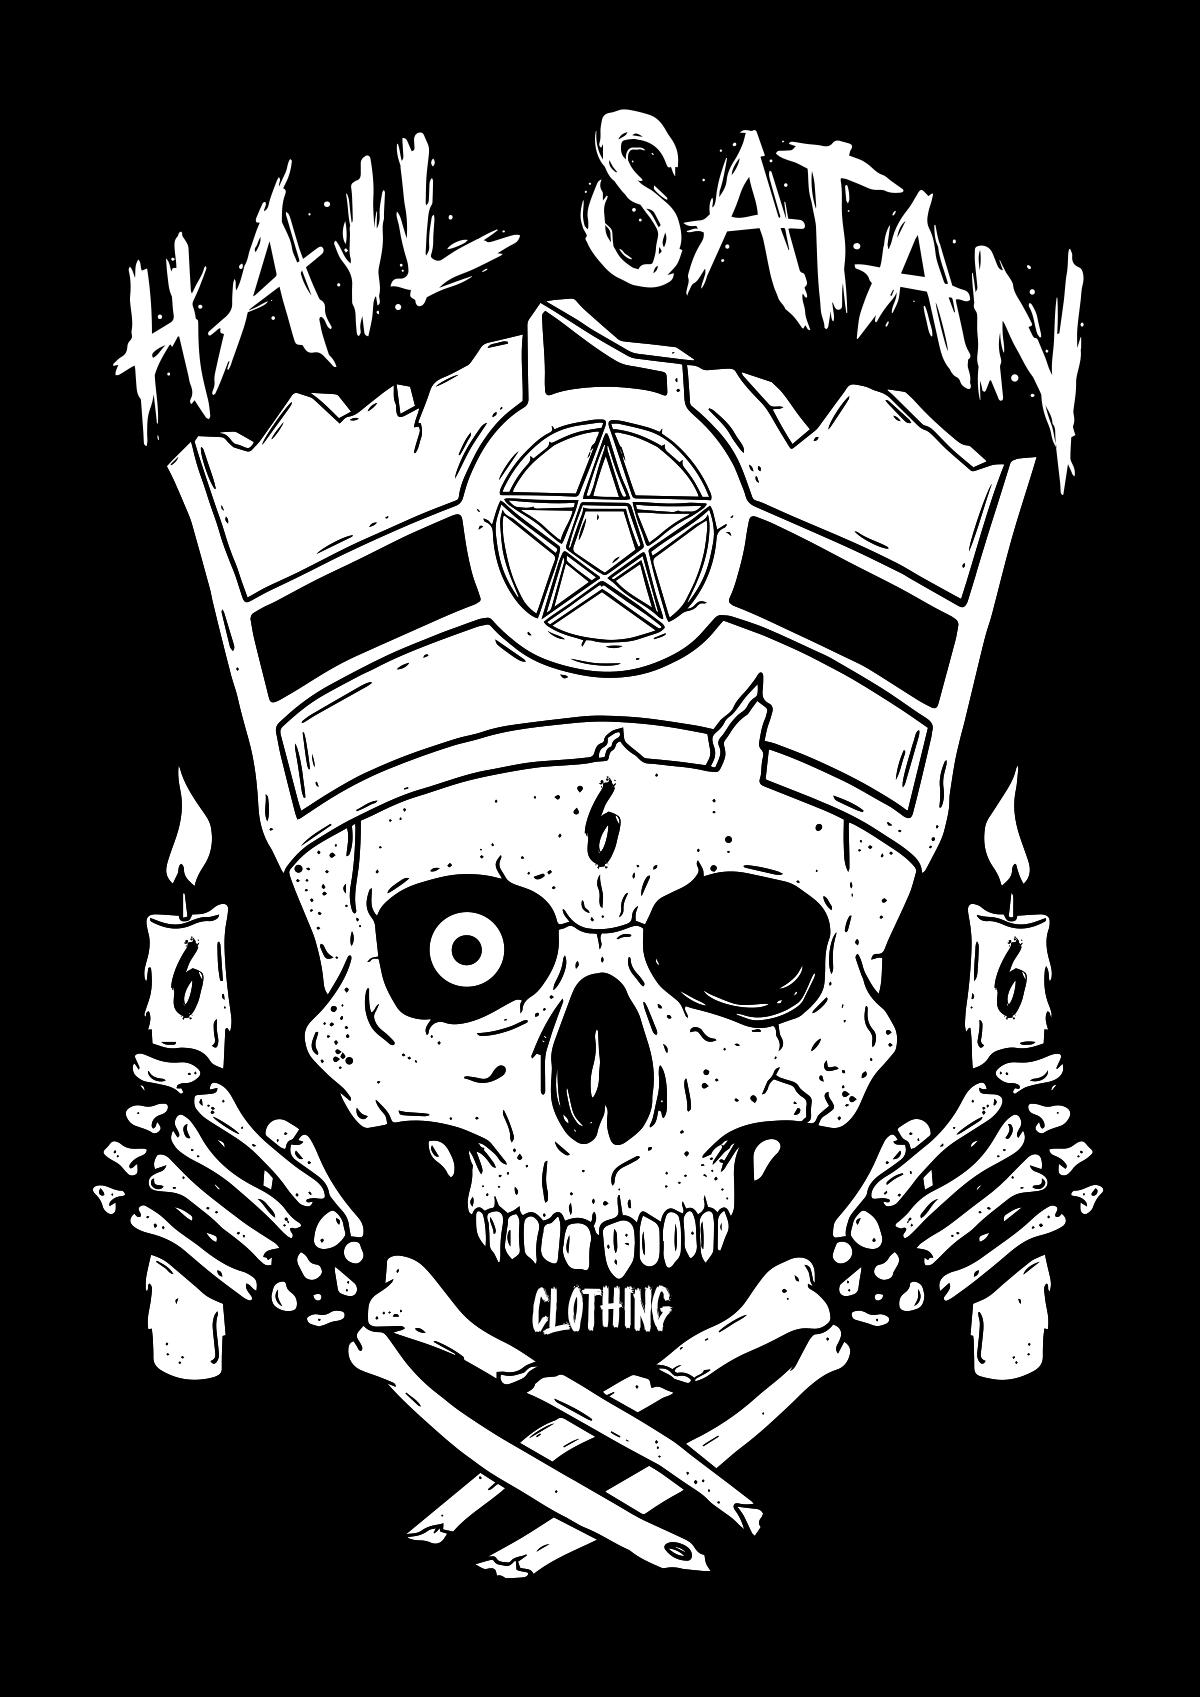 Logo for metal themed t-shirt company